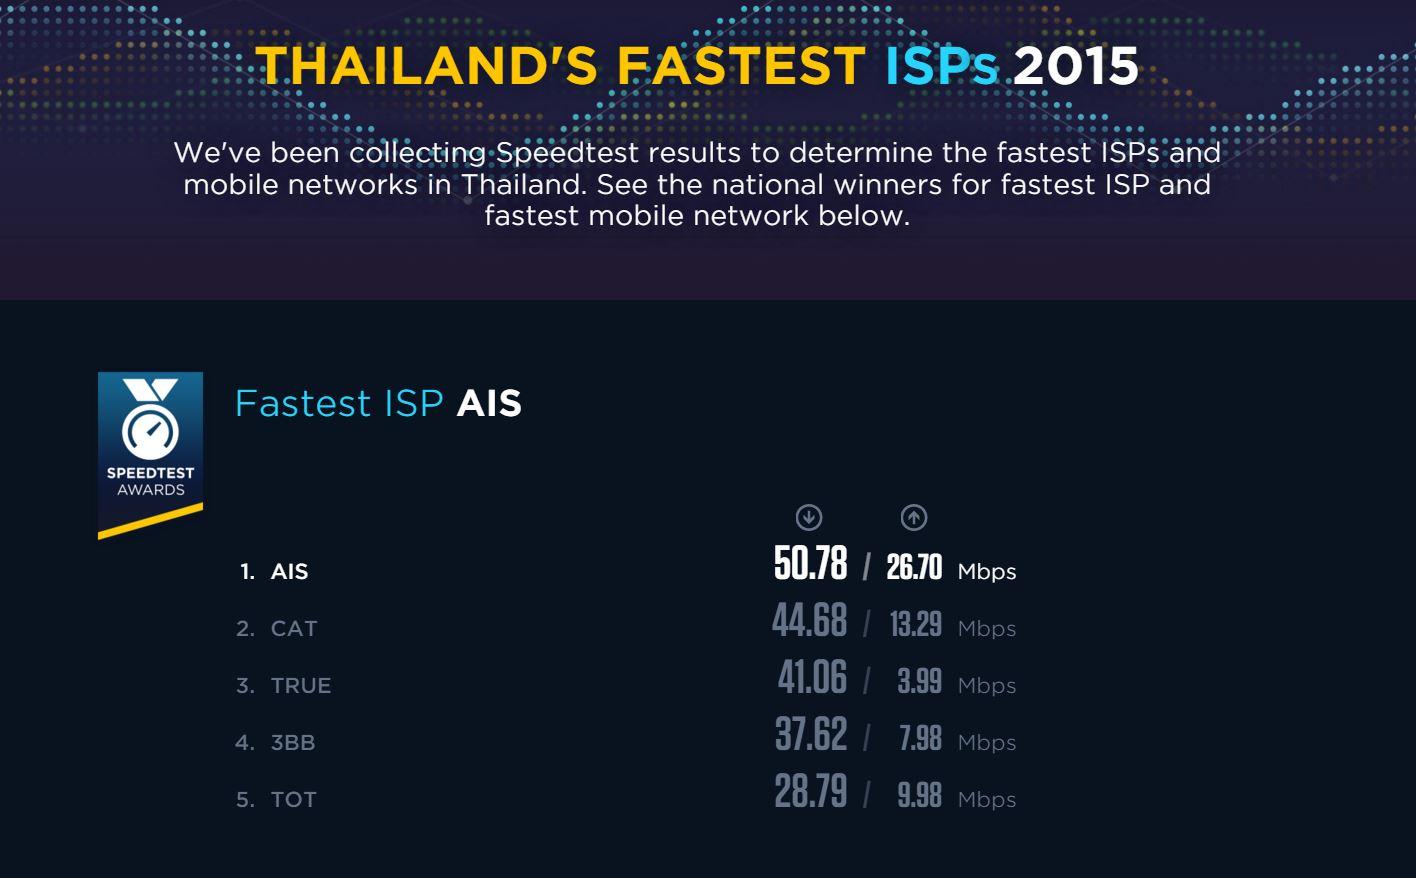 speedtest-fast-ISP-thailand-2015-ais-cat-true-3BB-TOT-001